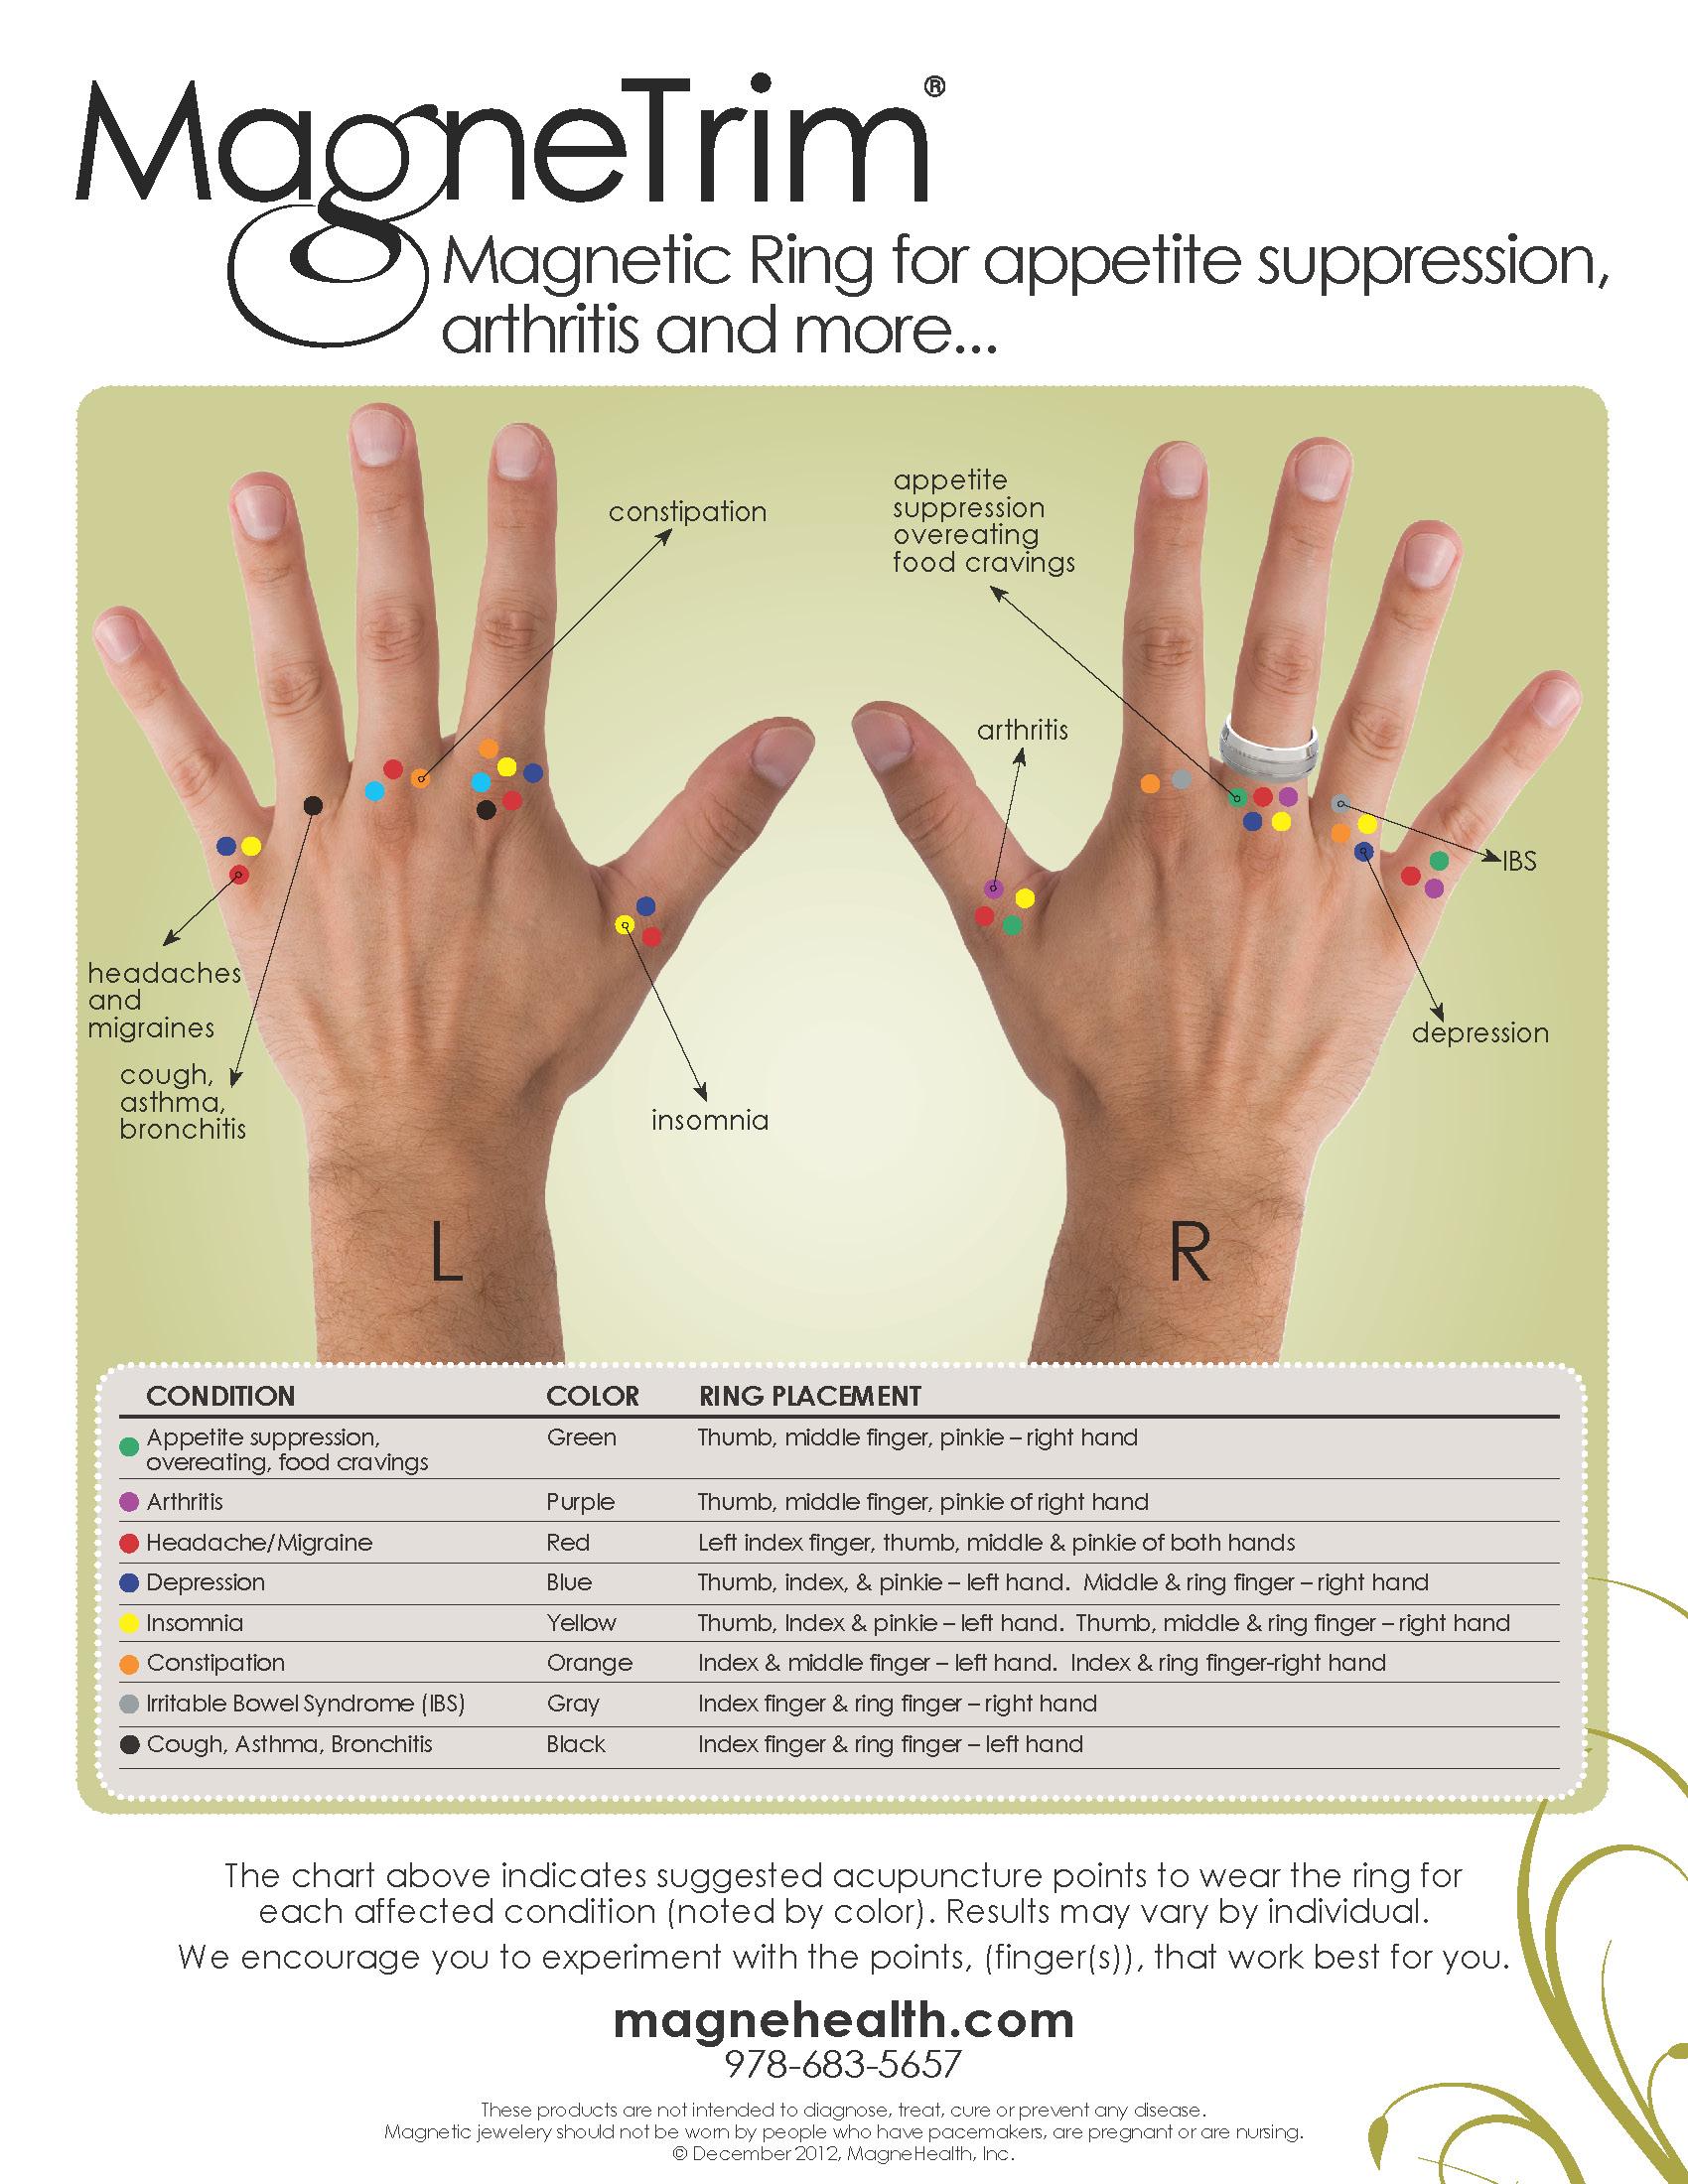 Appetite Suppression and Arthritis